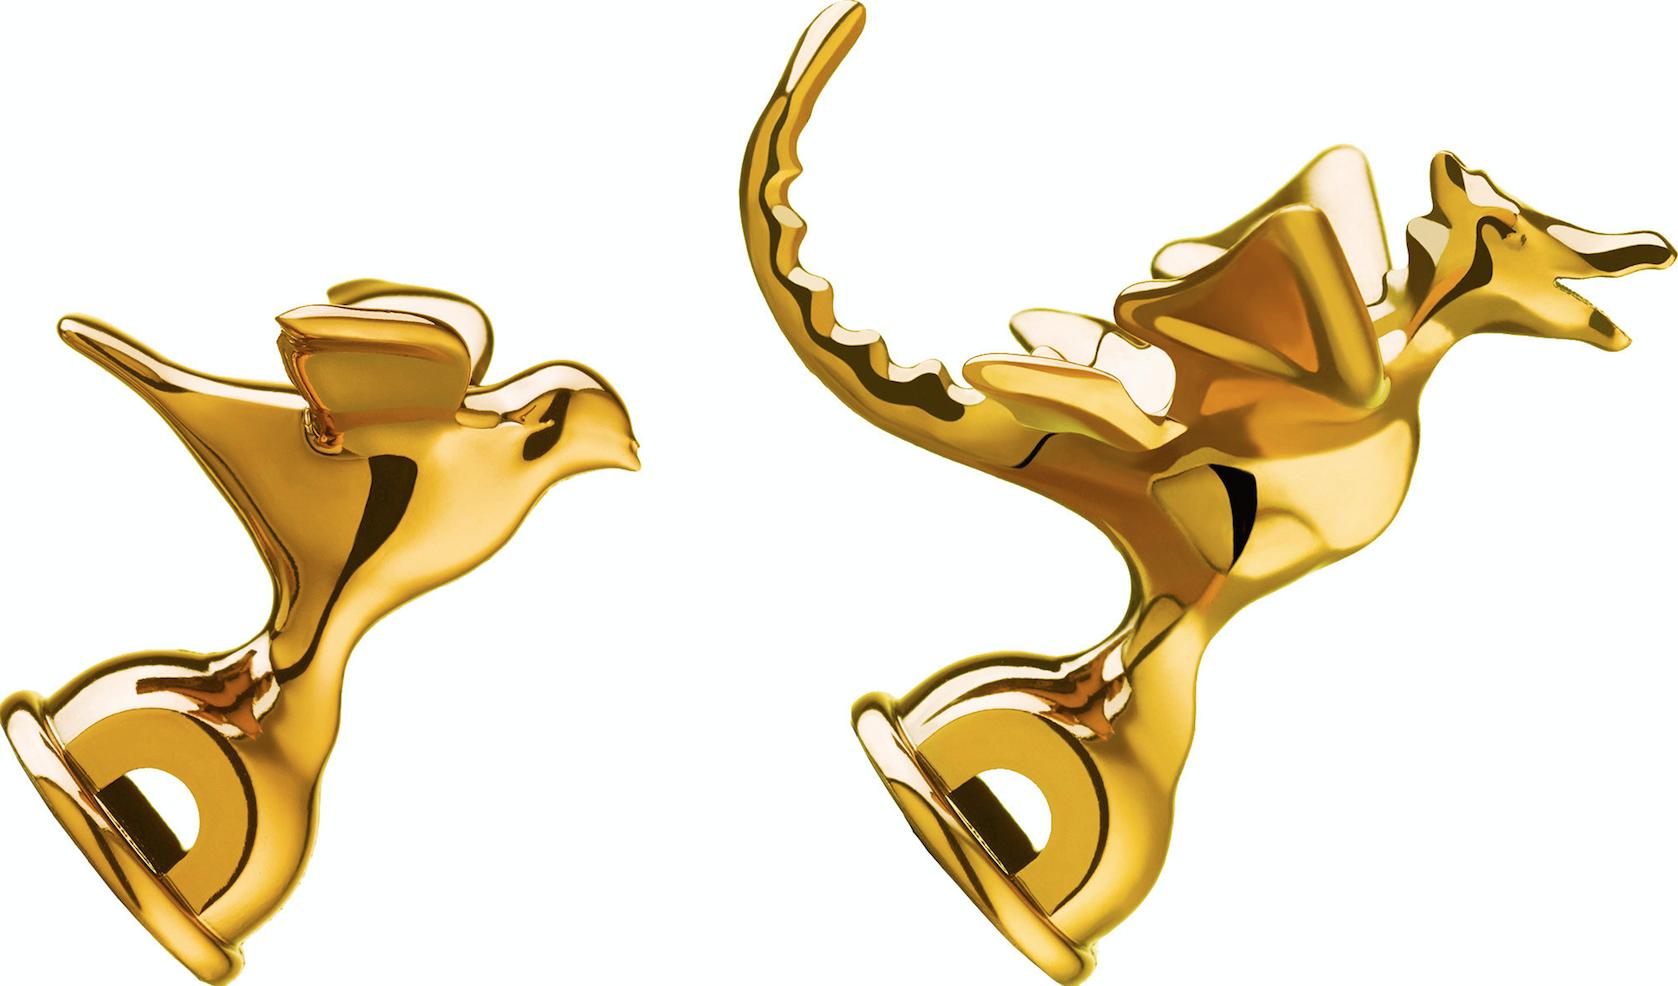 Alessi Pipkittel Visslor Guld 2 st